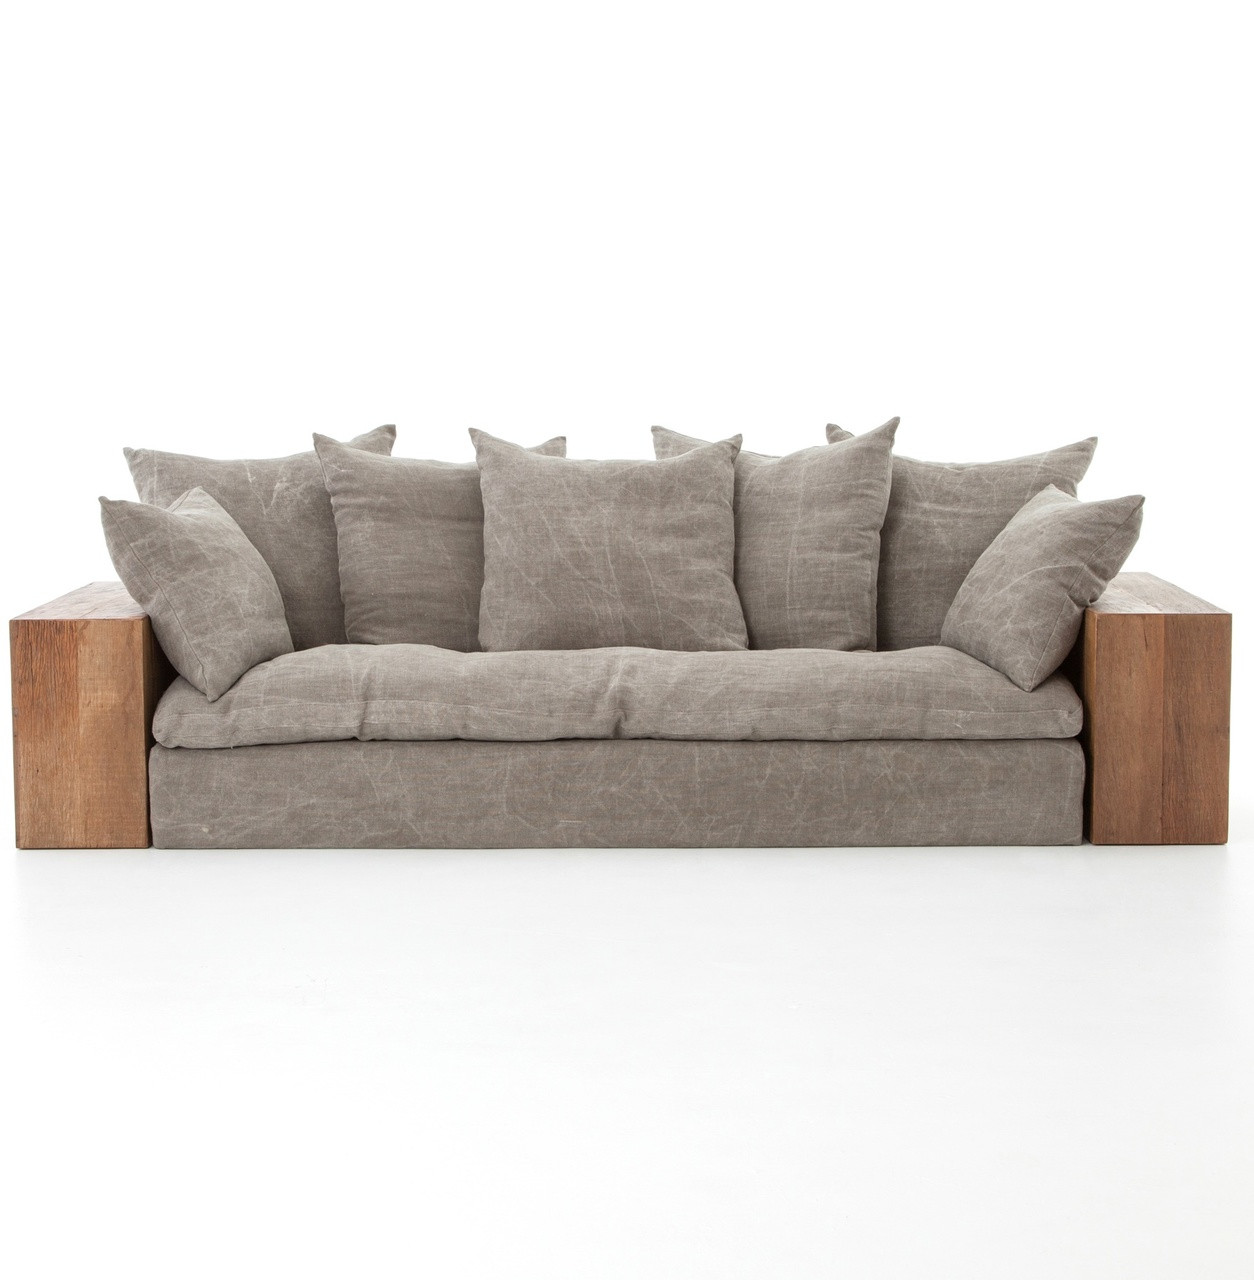 Industrial furniture sofa -  Wright Rustic Lodge Wood Block Stonewash Grey Taupe Jute Sofa